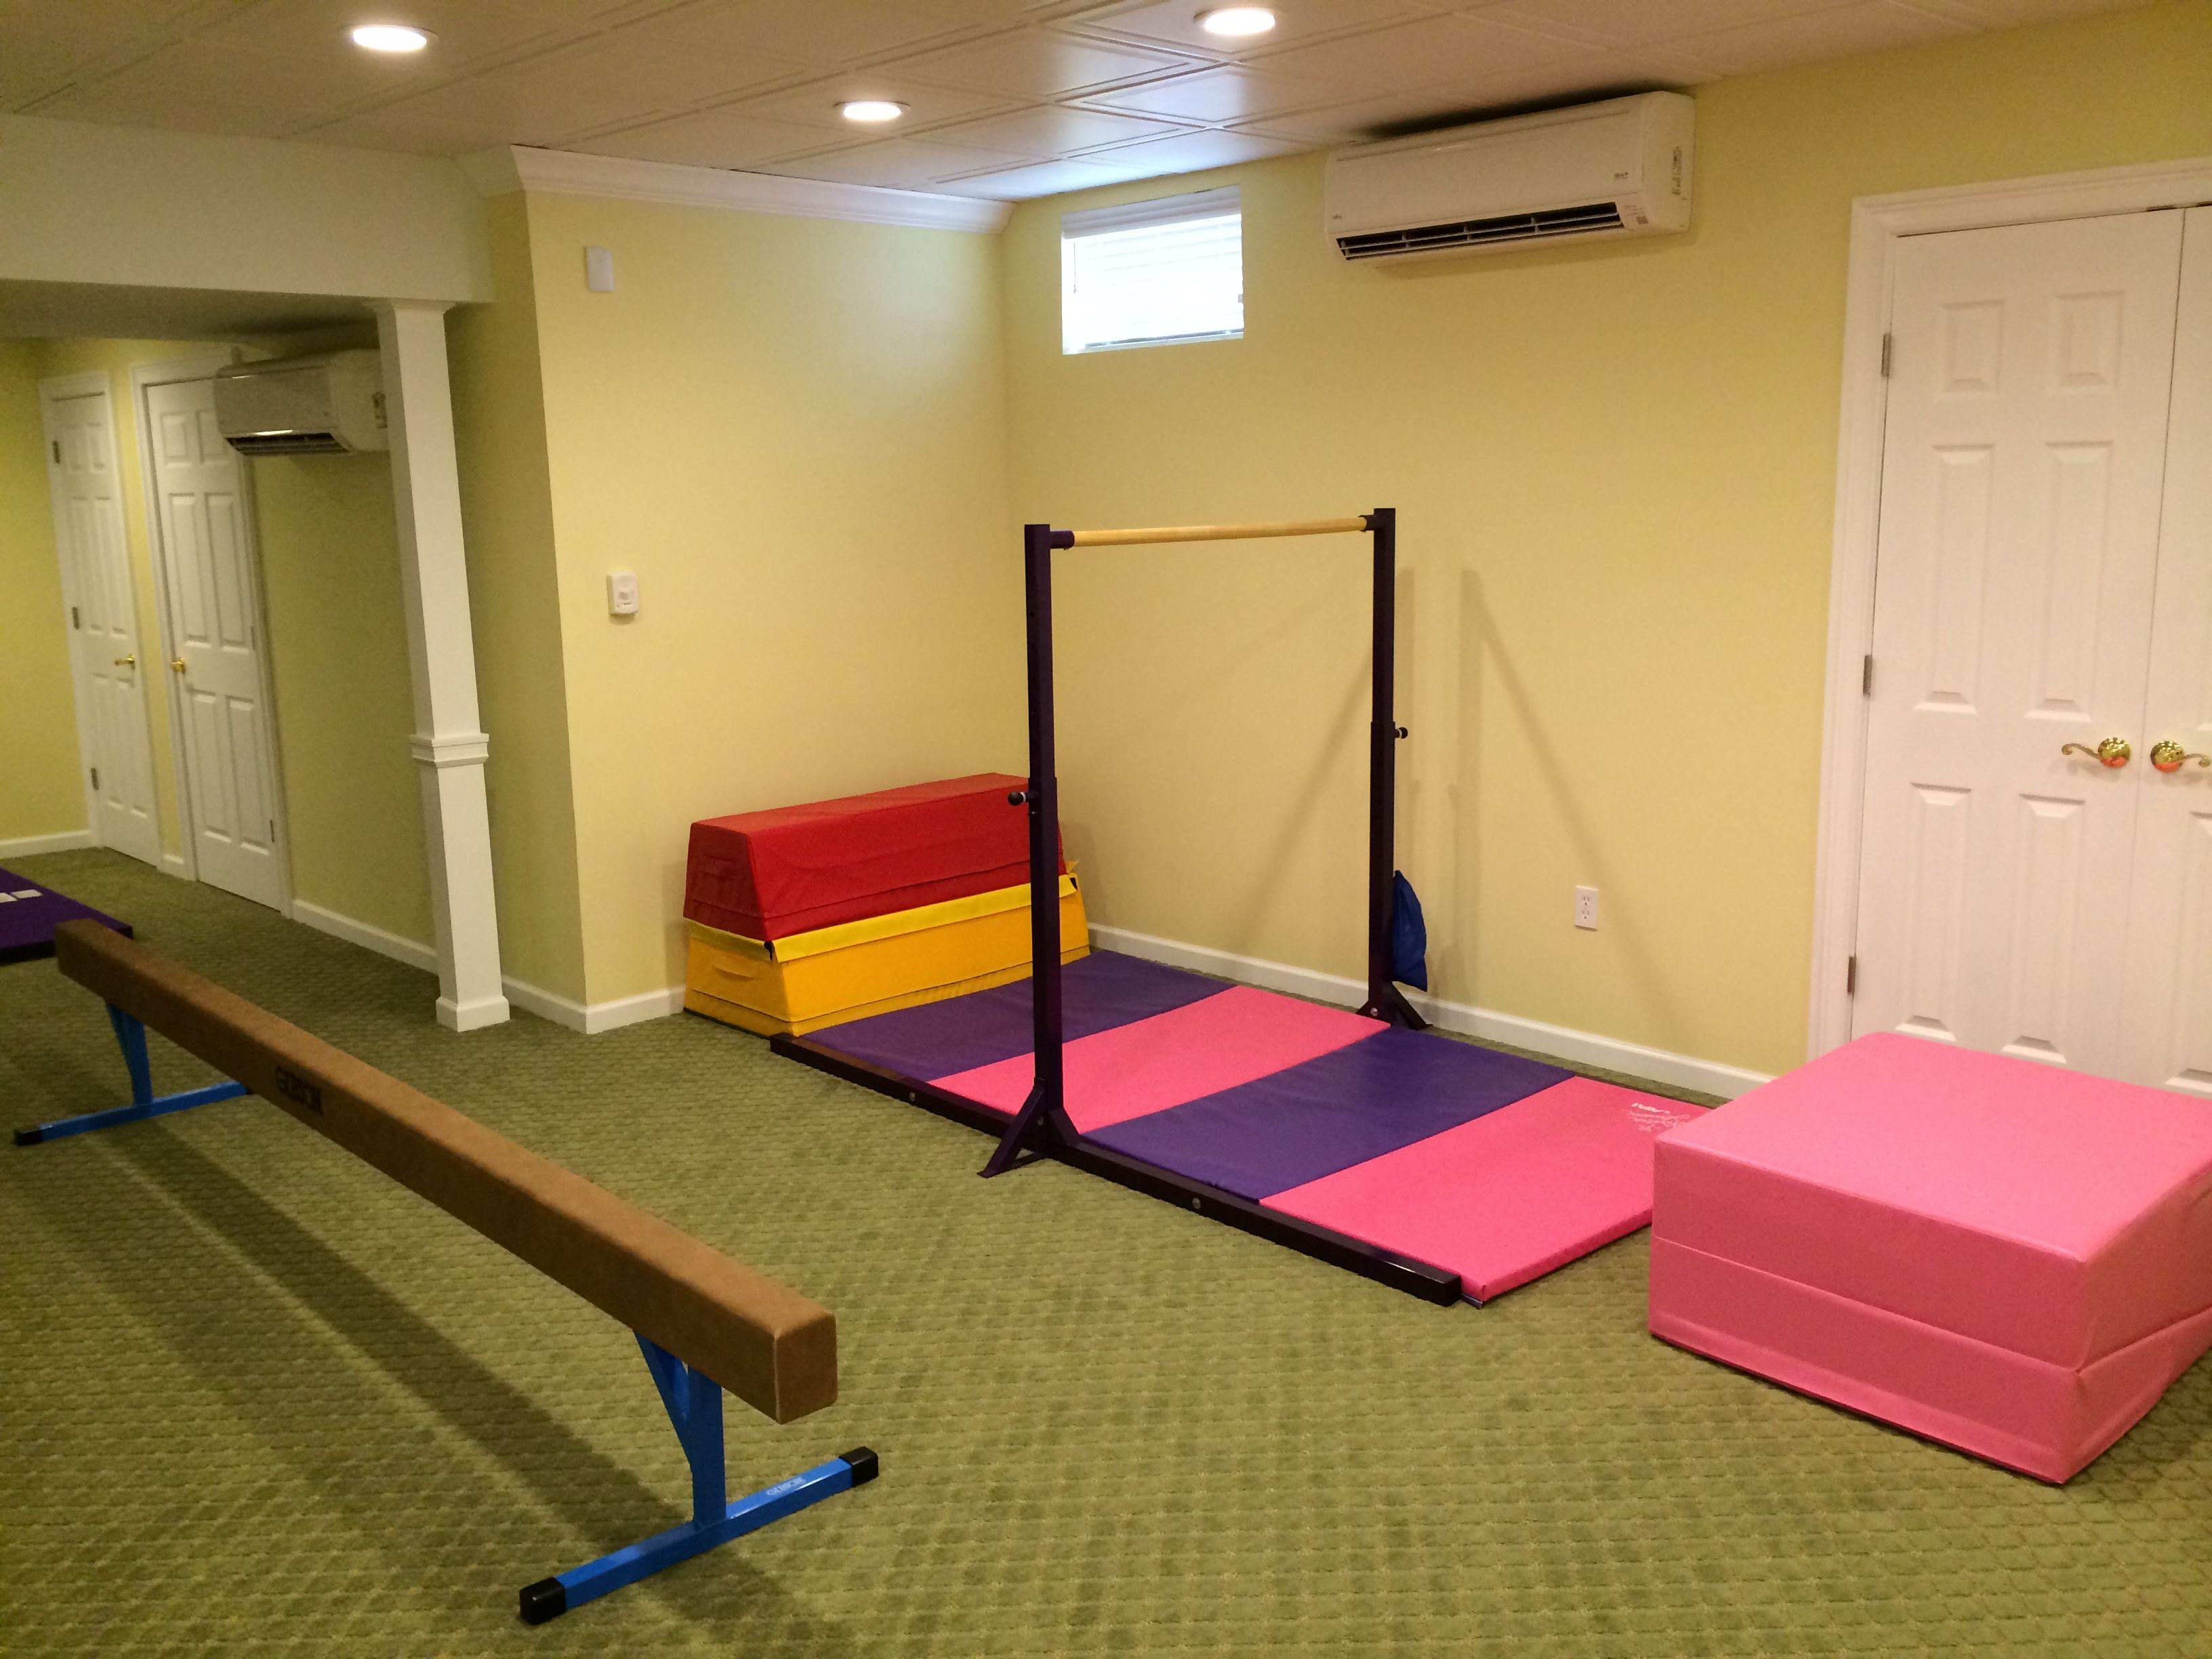 Basement Remodel With A Kids Gymnastics Area Basement